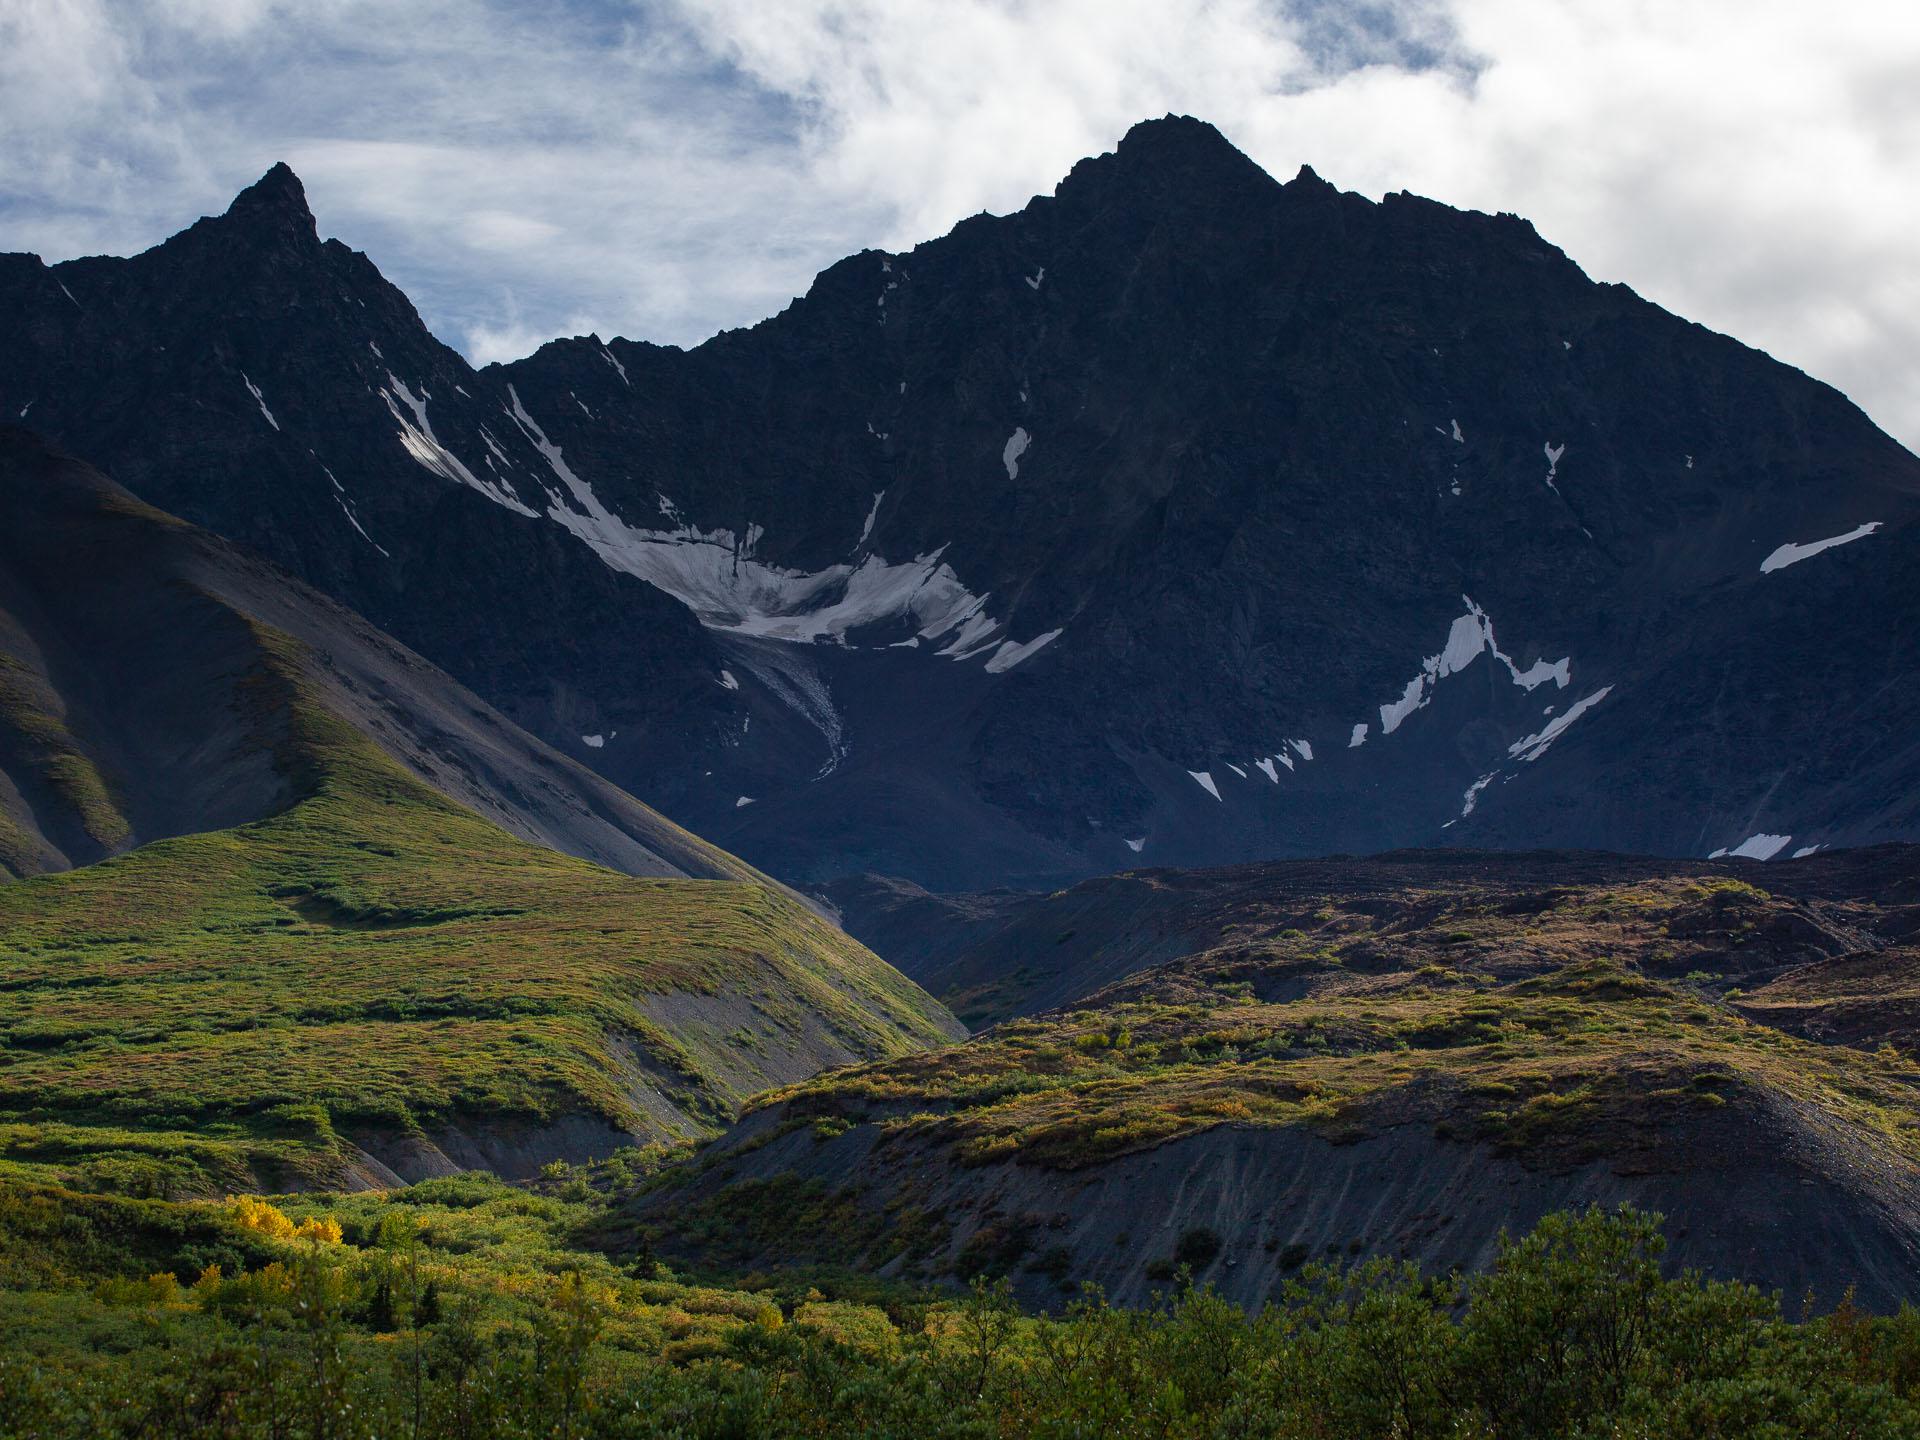 mountains in Kluane National Park